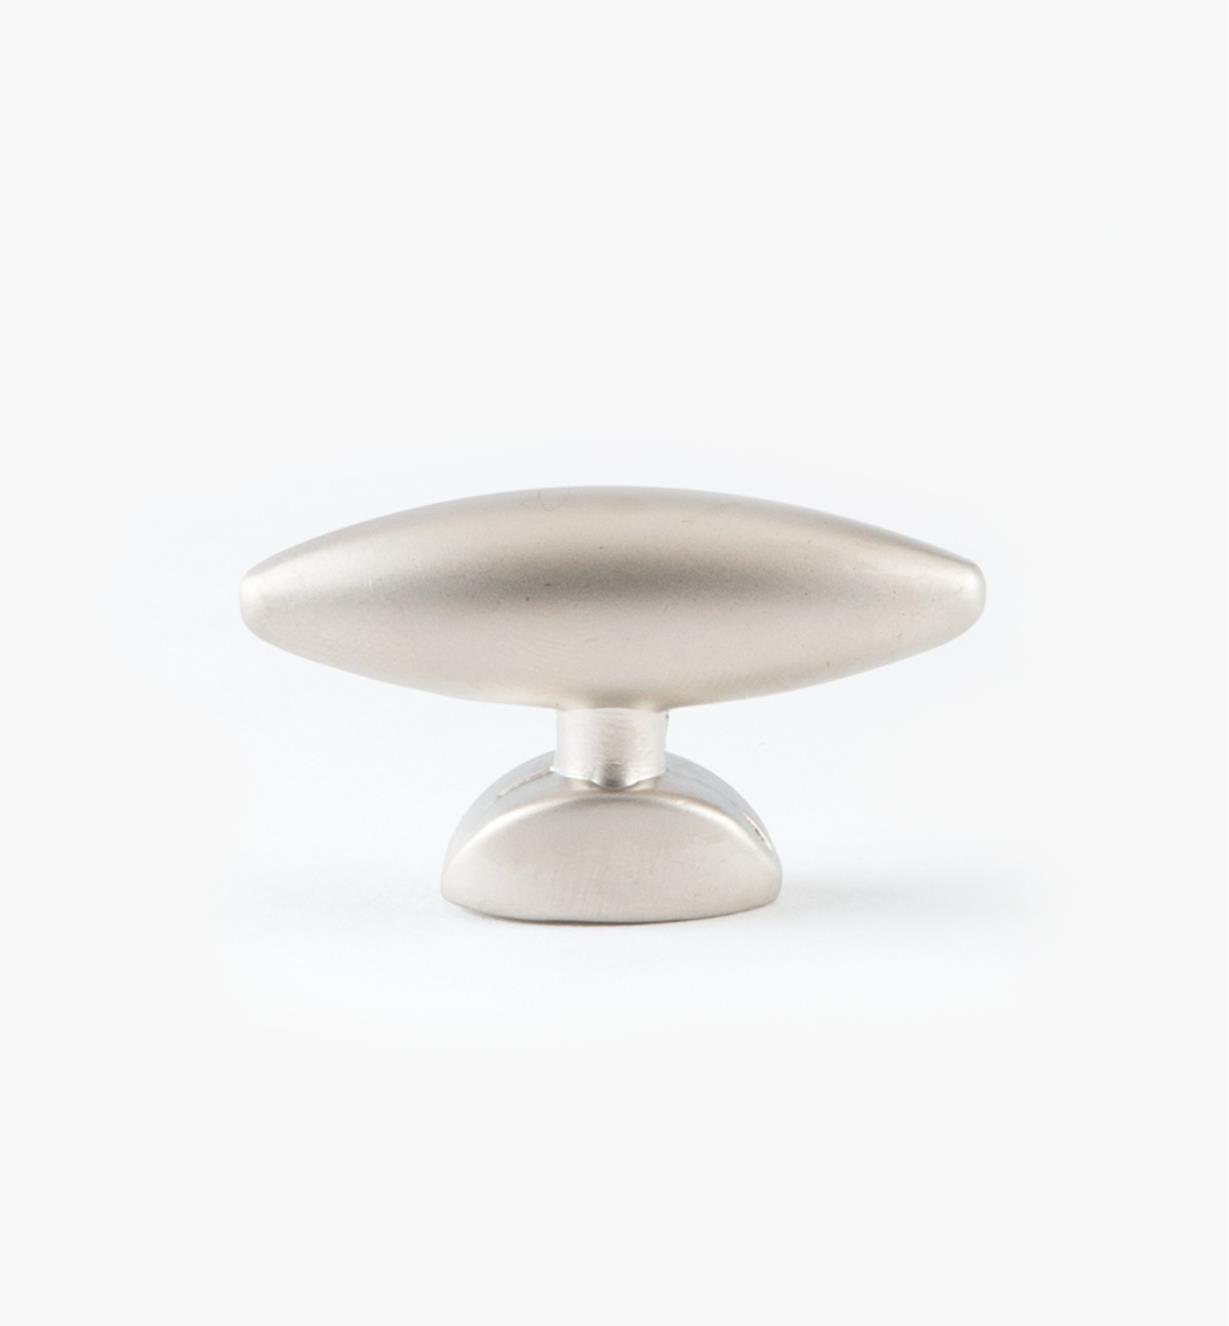 "03W2278 - 1 5/8"" x 15/16"" Small Oval Pearl Nickel Knob, each"